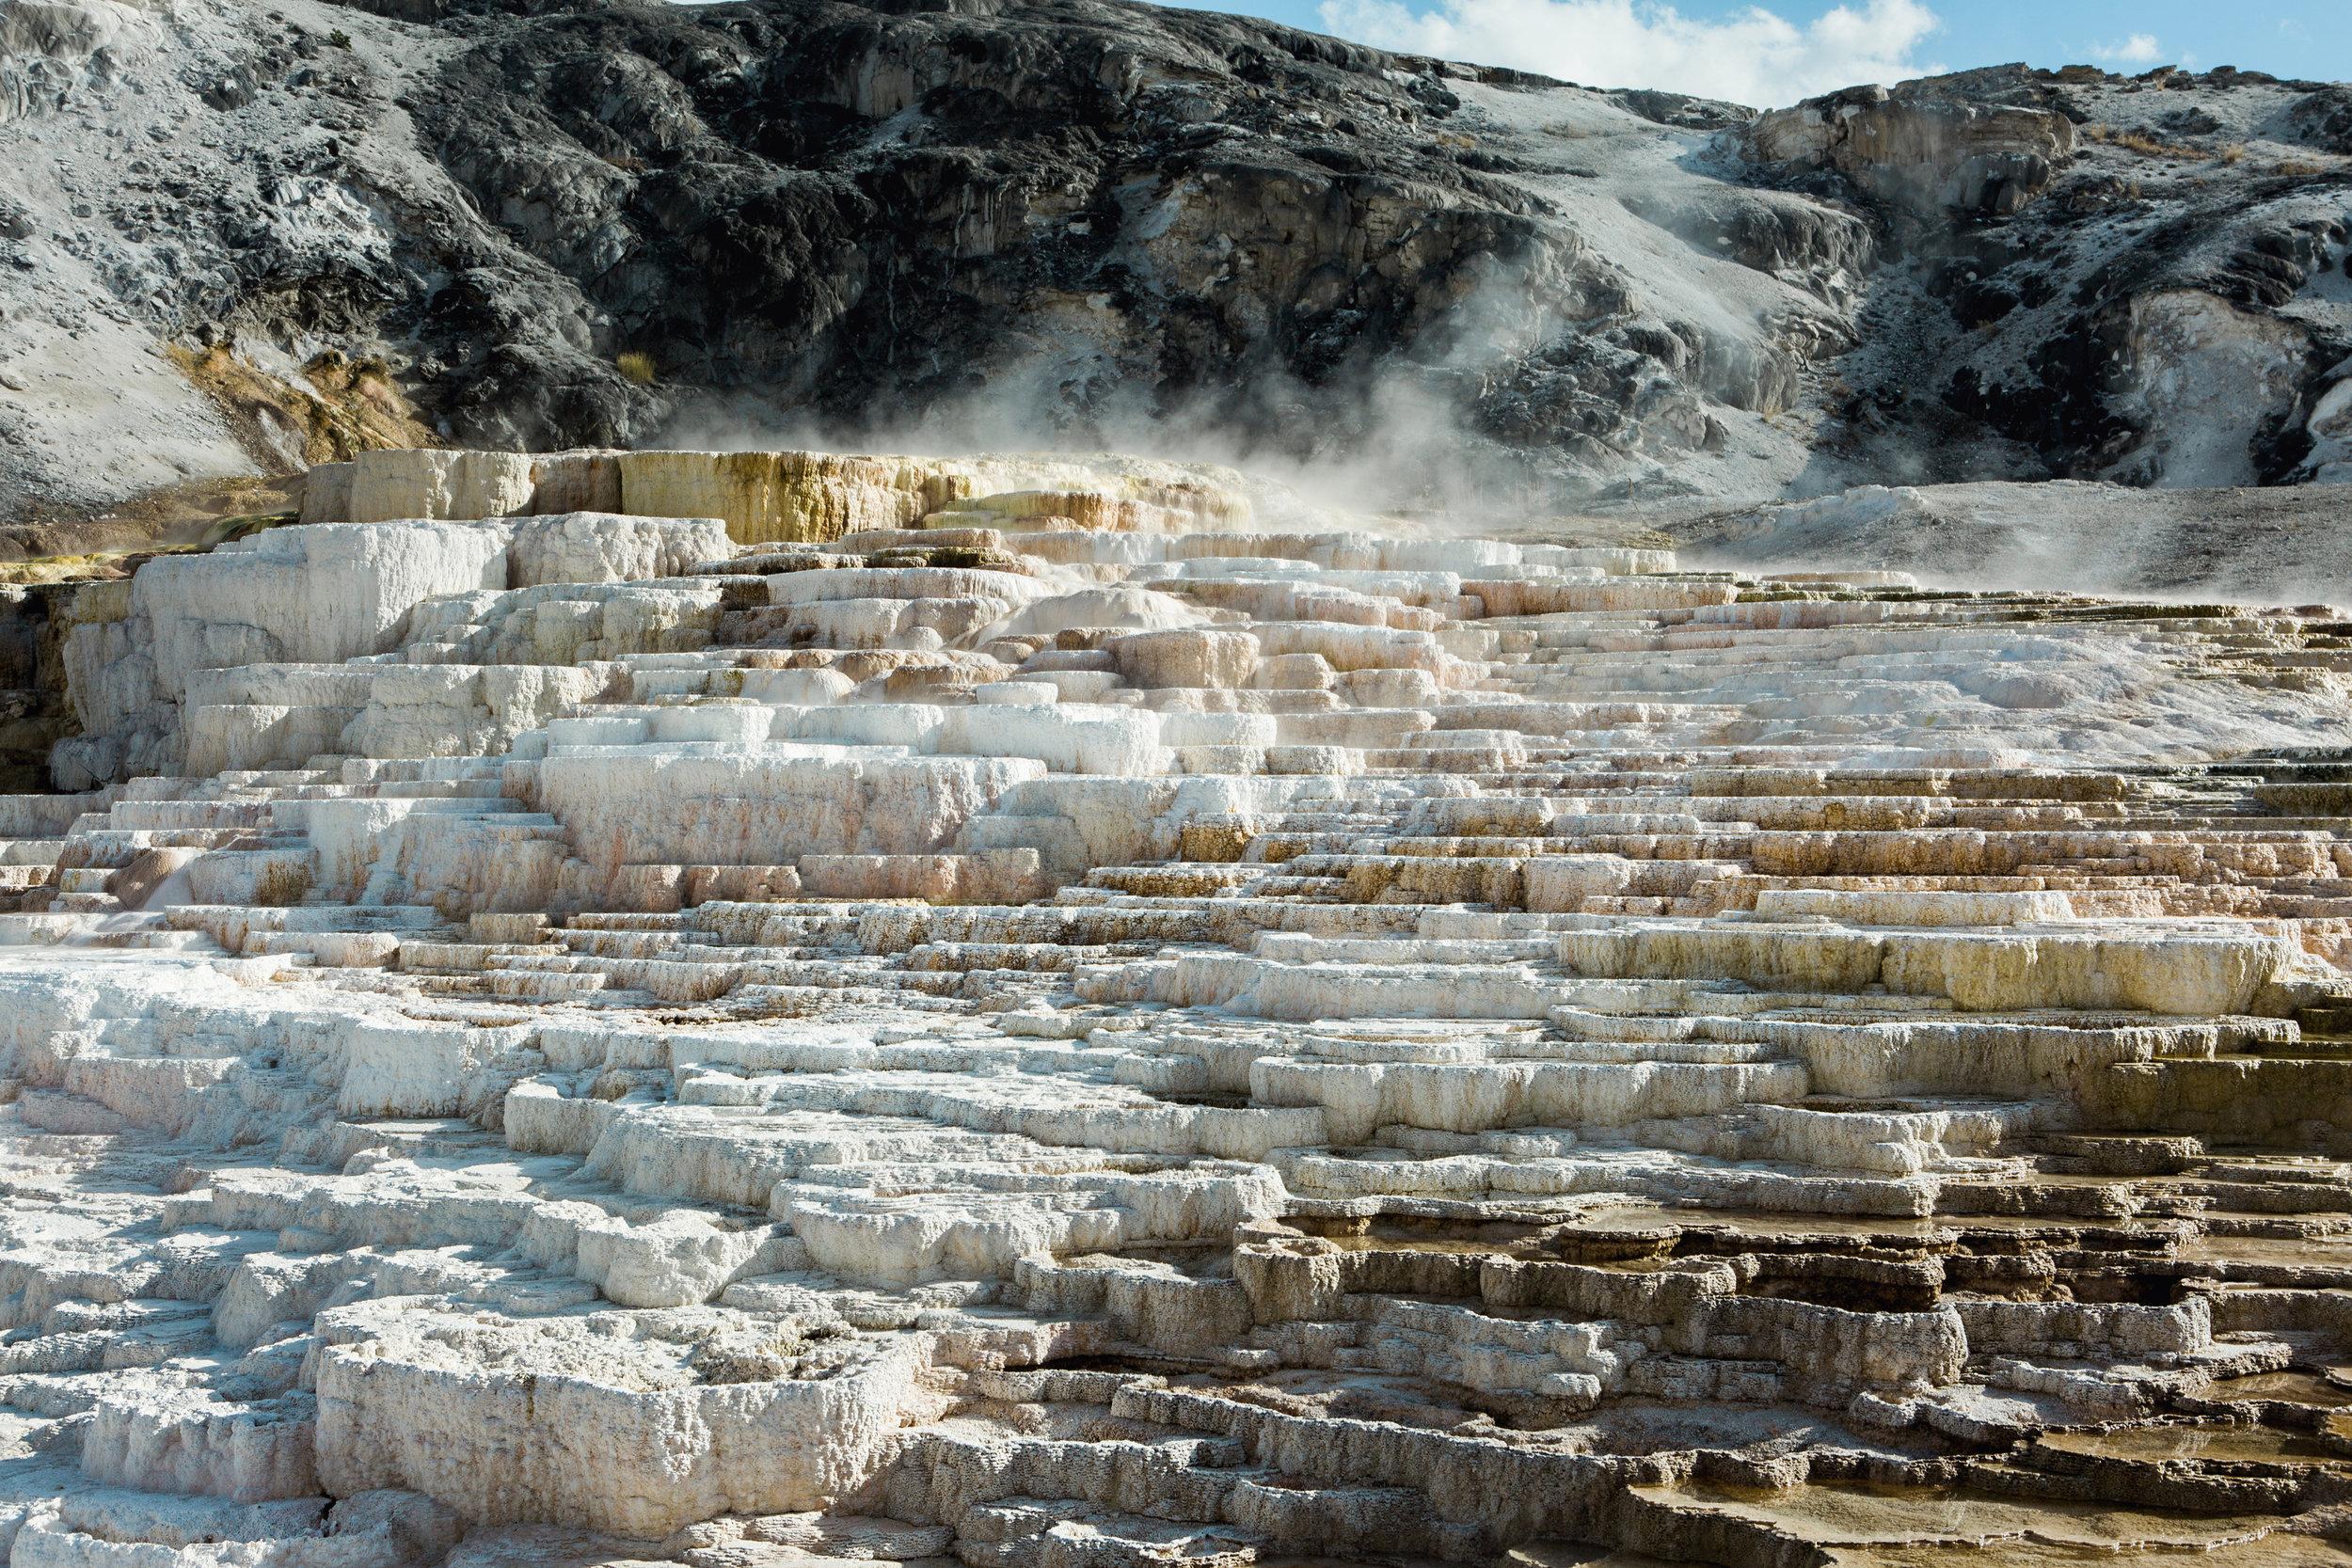 CindyGiovagnoli_Yellowstone_National_Park_Montana_Wyoming_bison_pronghorn_snow_elk_truckcamping-006.jpg